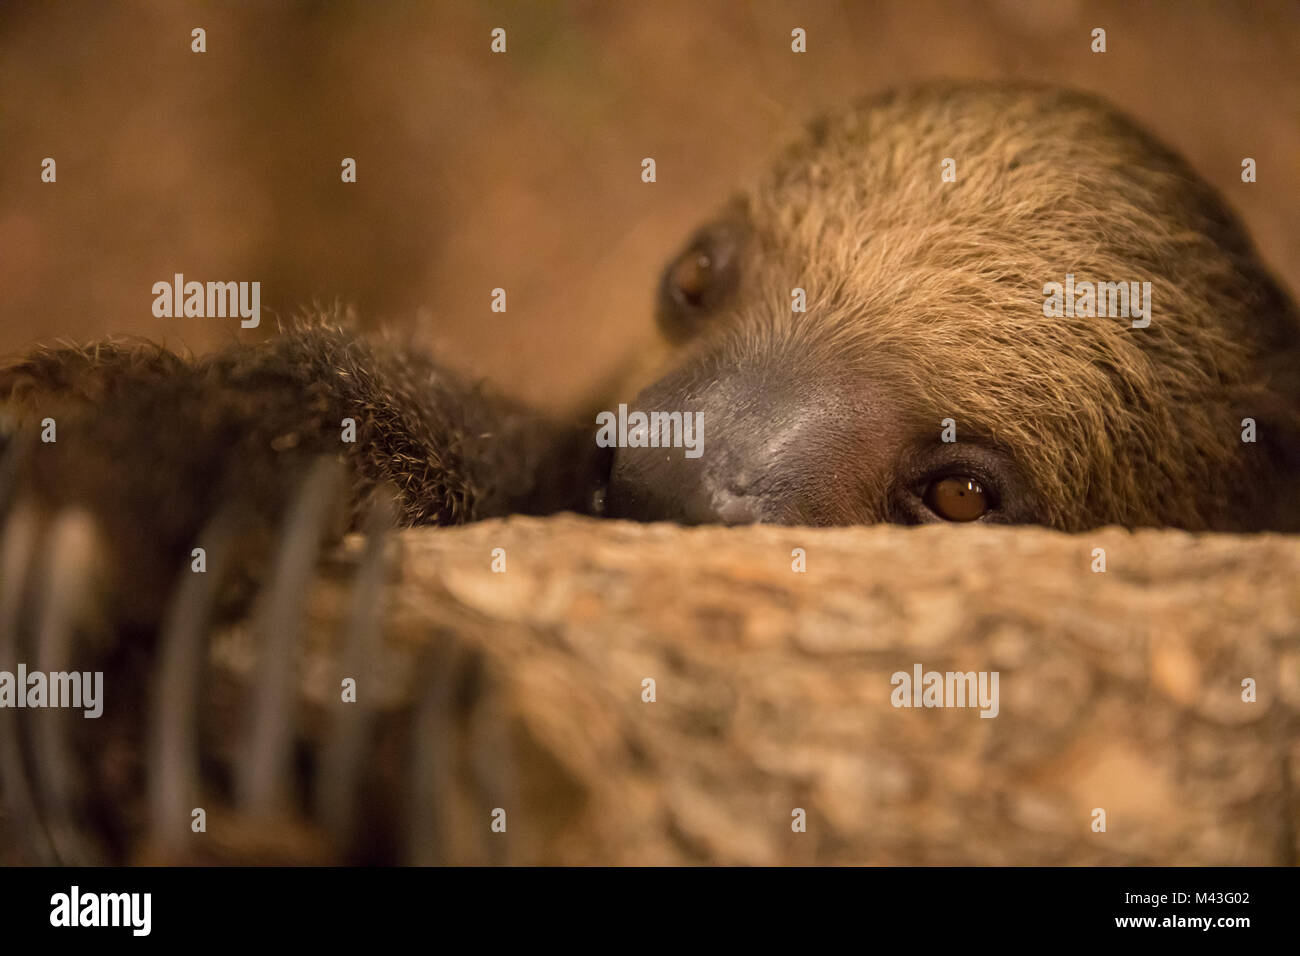 Close-up portrait of a shy Linnaeus's two-toed sloth (Choloepus didactylus). Dubai, UAE. - Stock Image